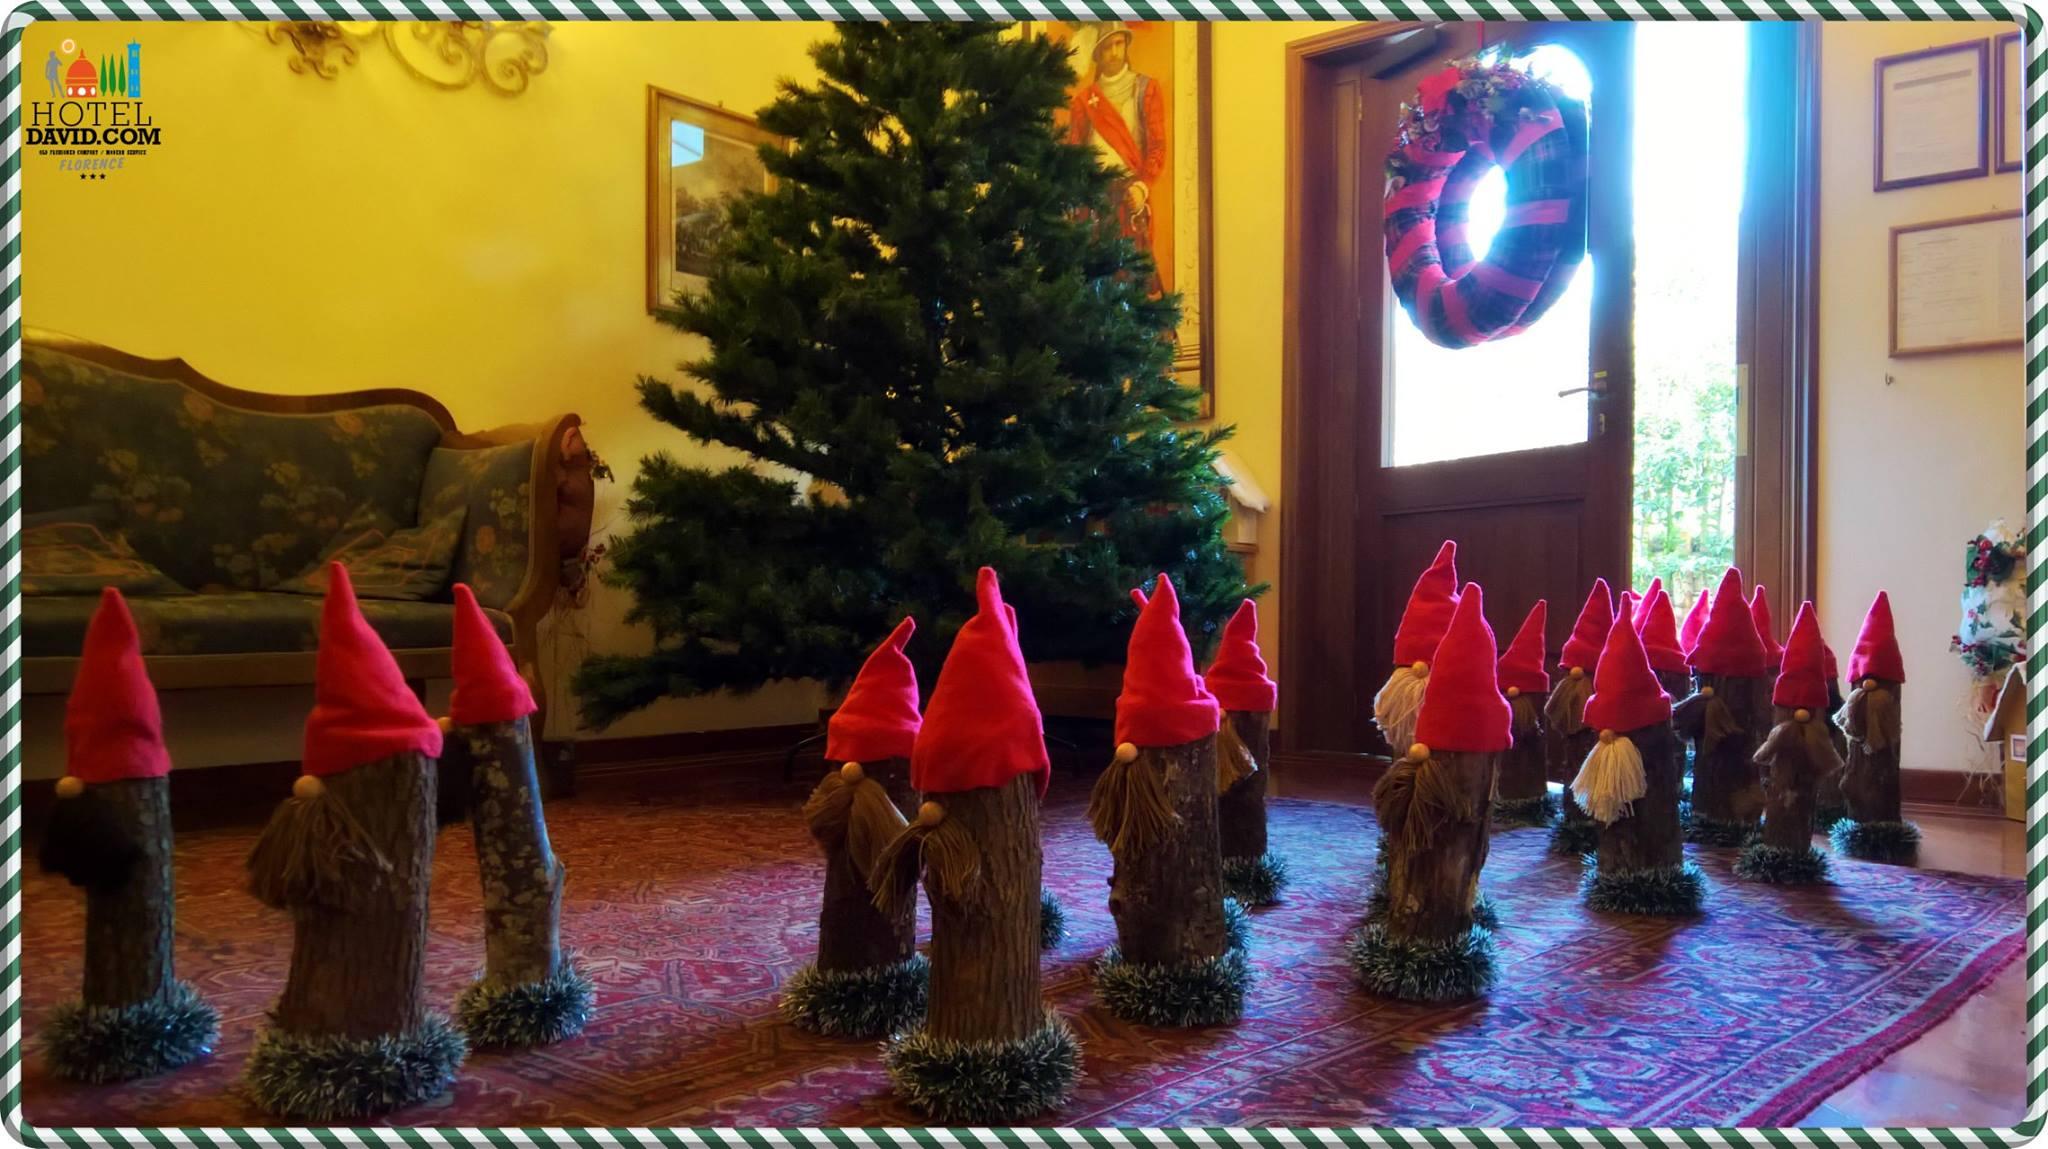 Natale nell'hotel David di Firenze